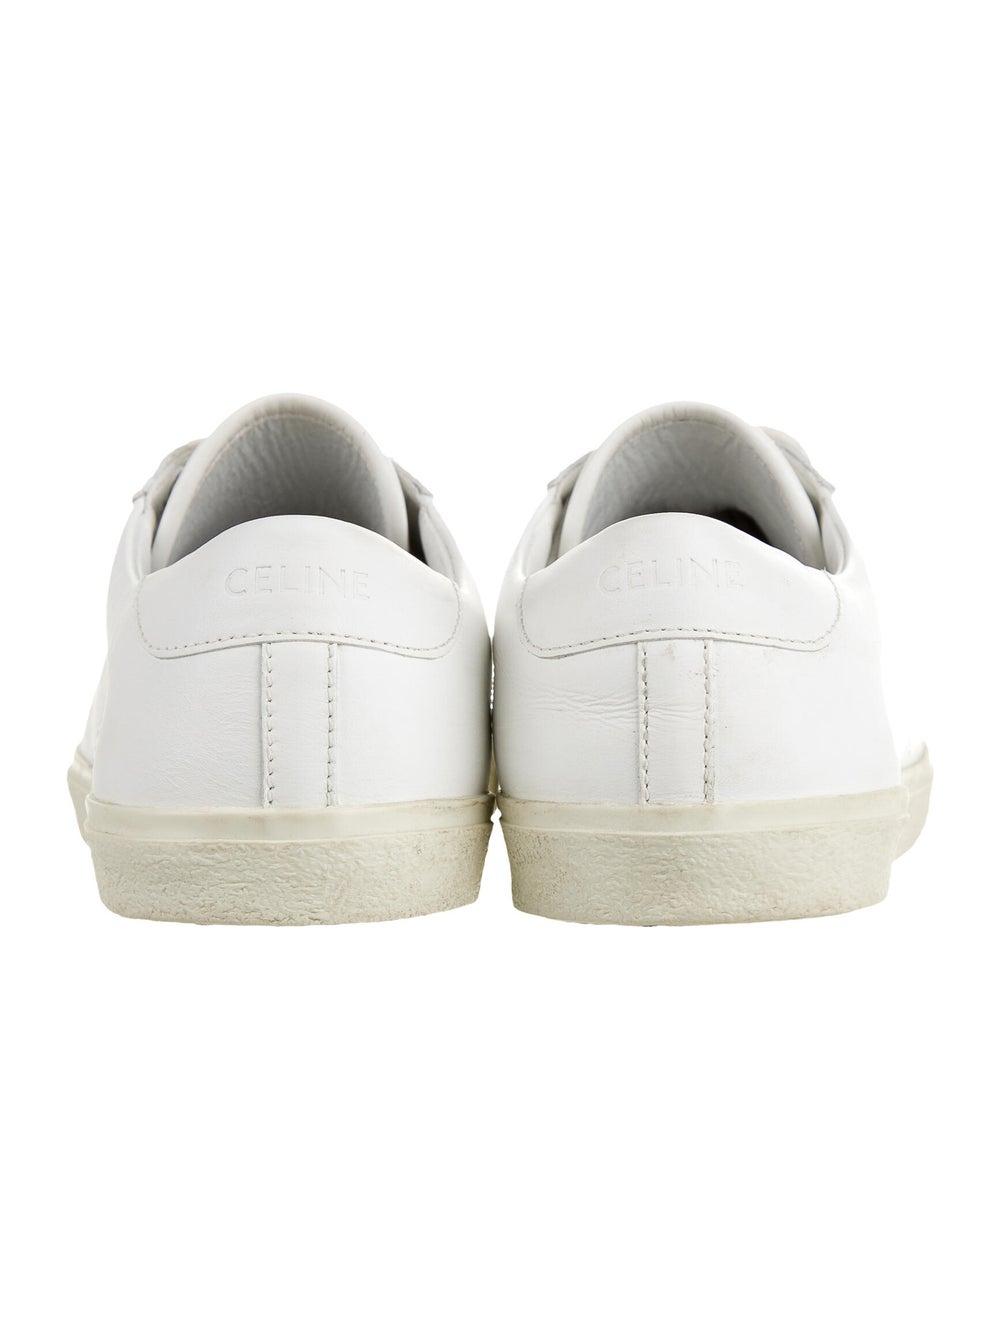 Celine Triomphe Sneakers White - image 4